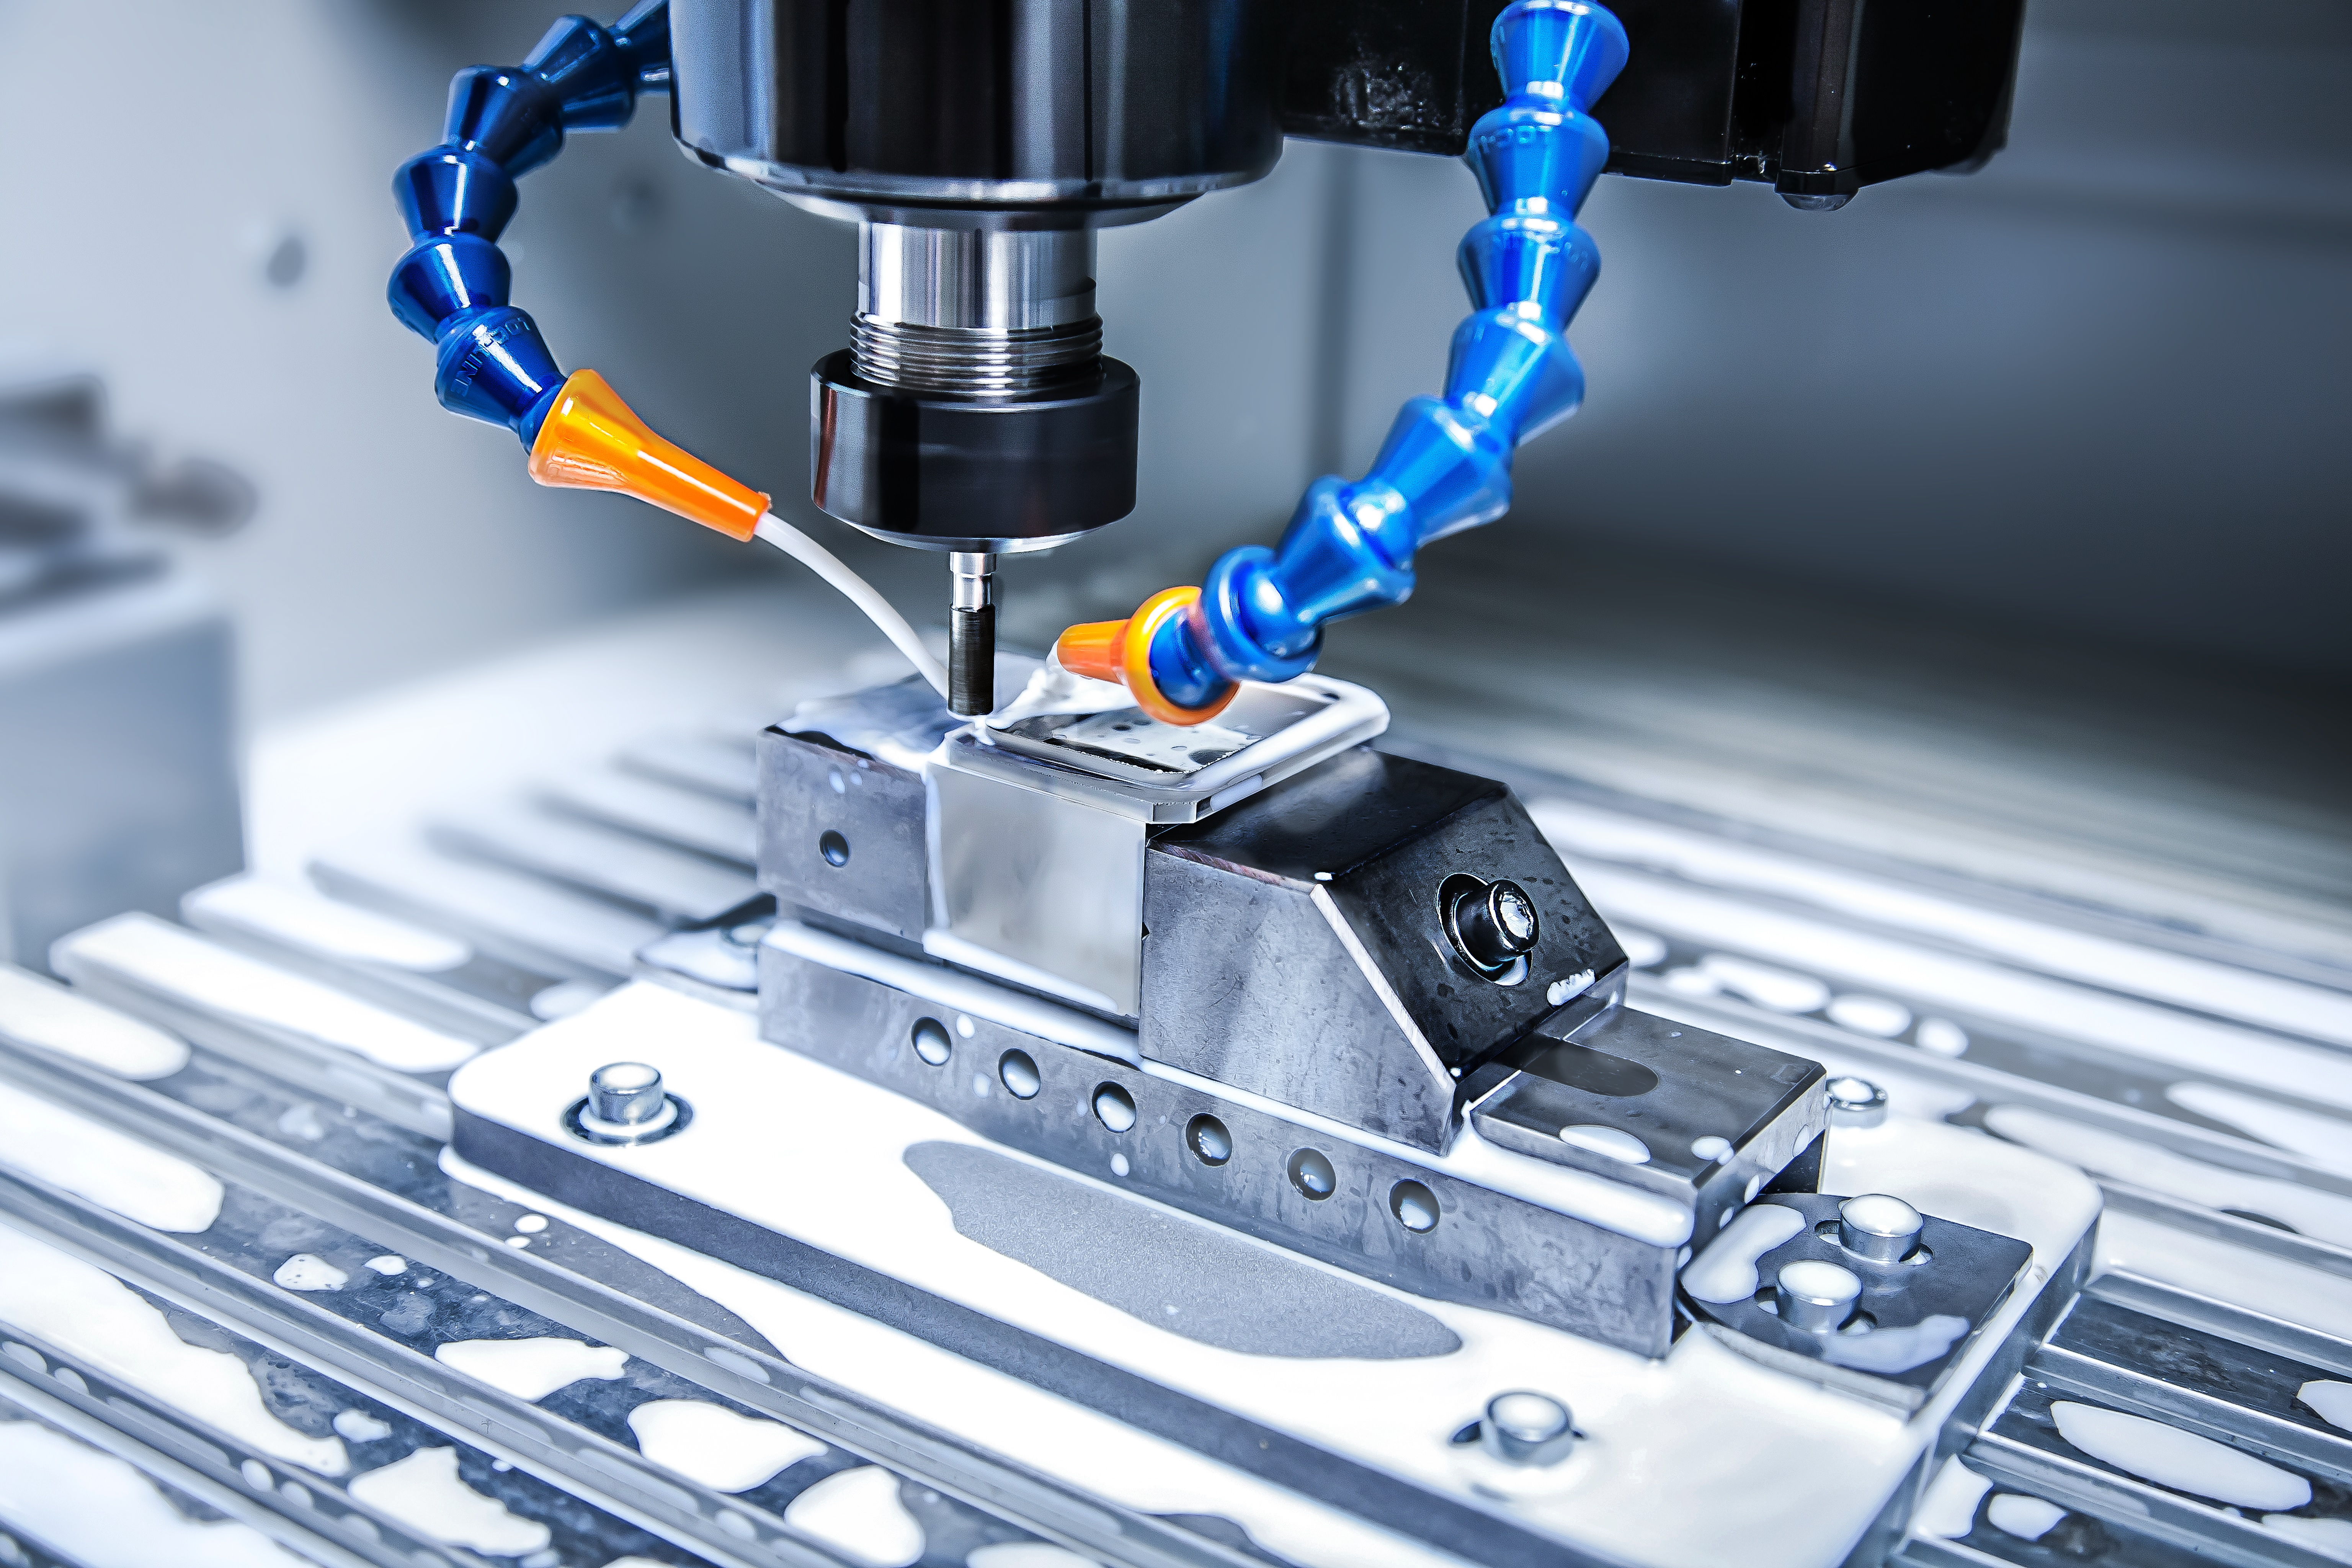 Optics CNC drilling